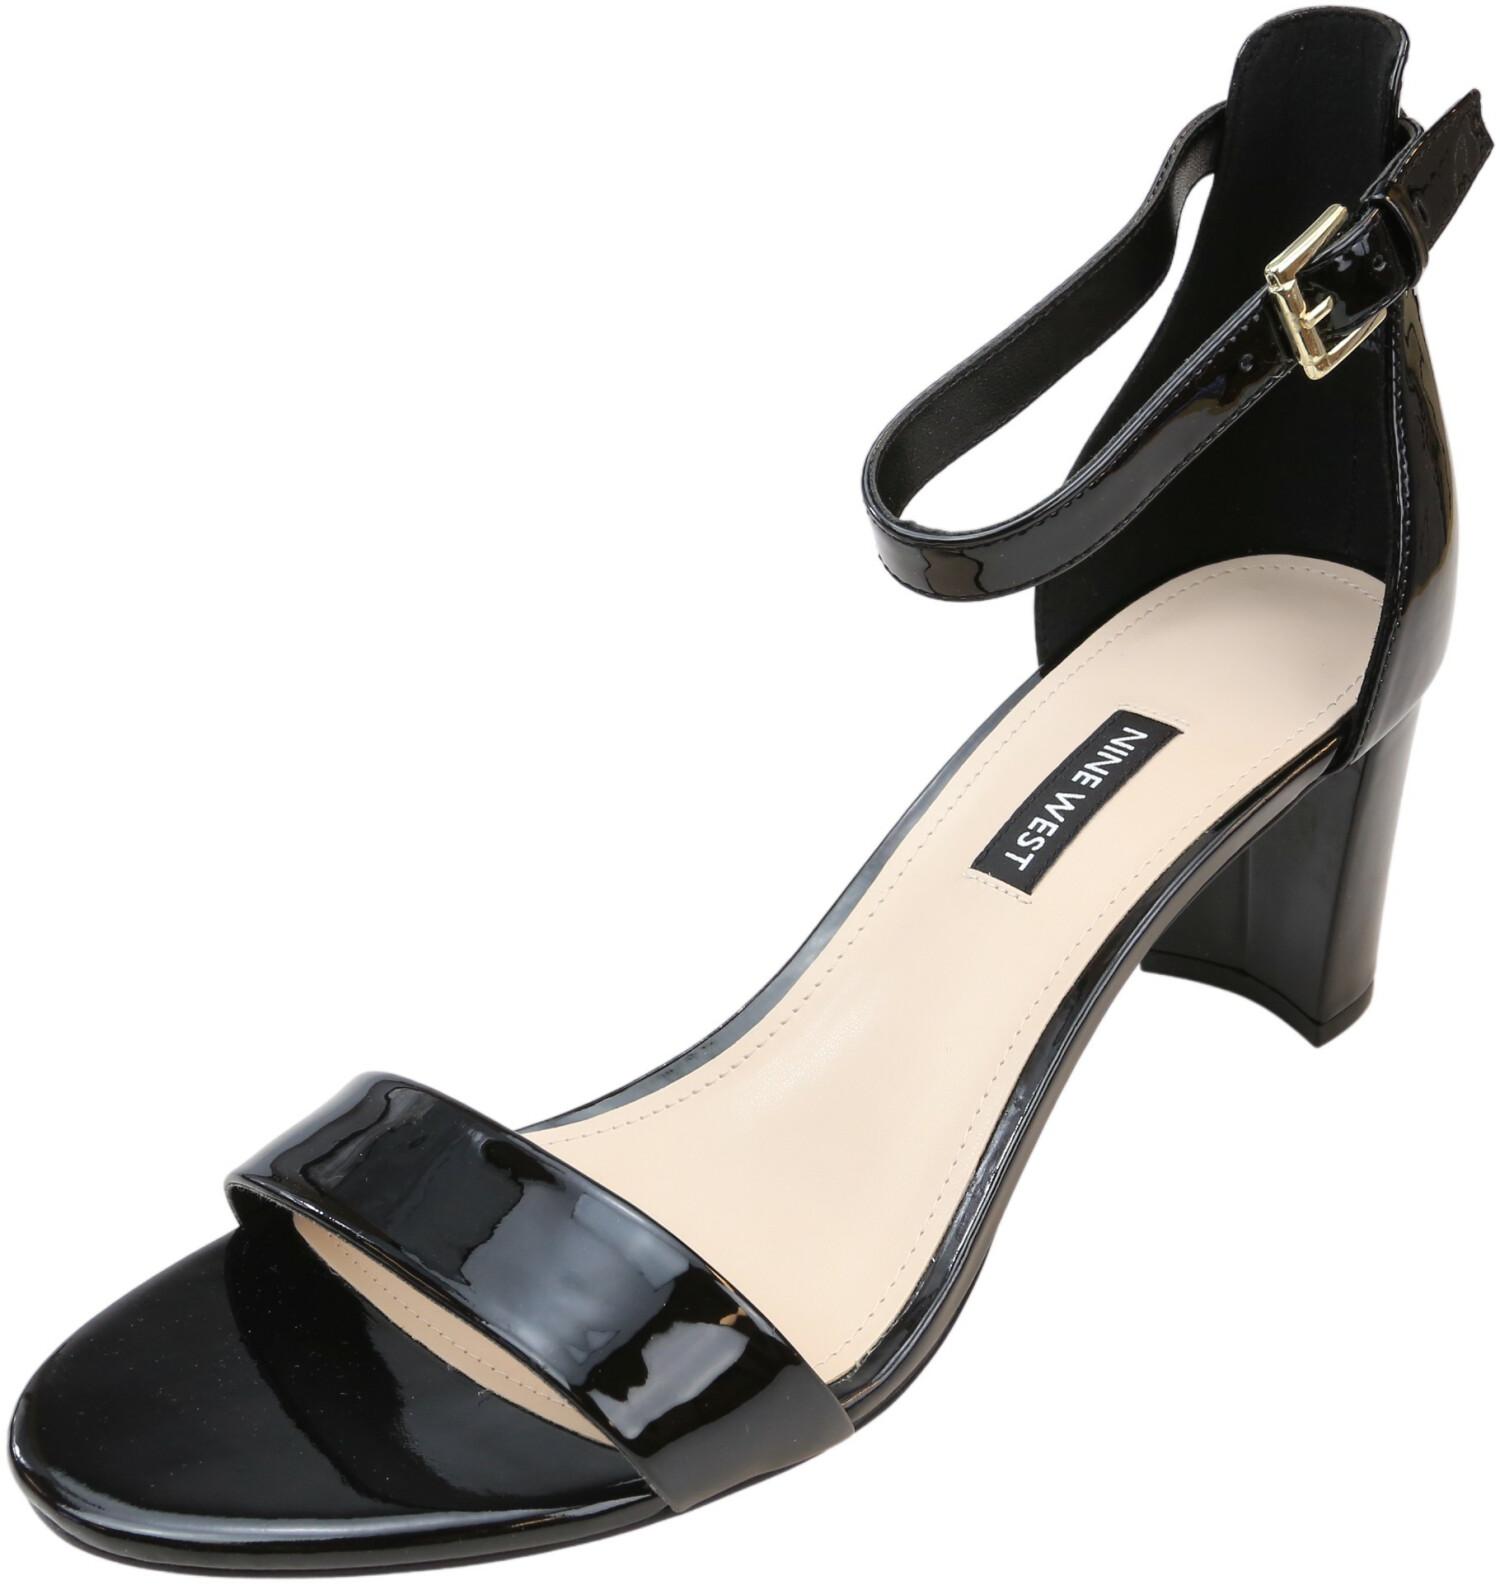 Nine West Women's Spruce Black Ankle-High Pump - 9.5M